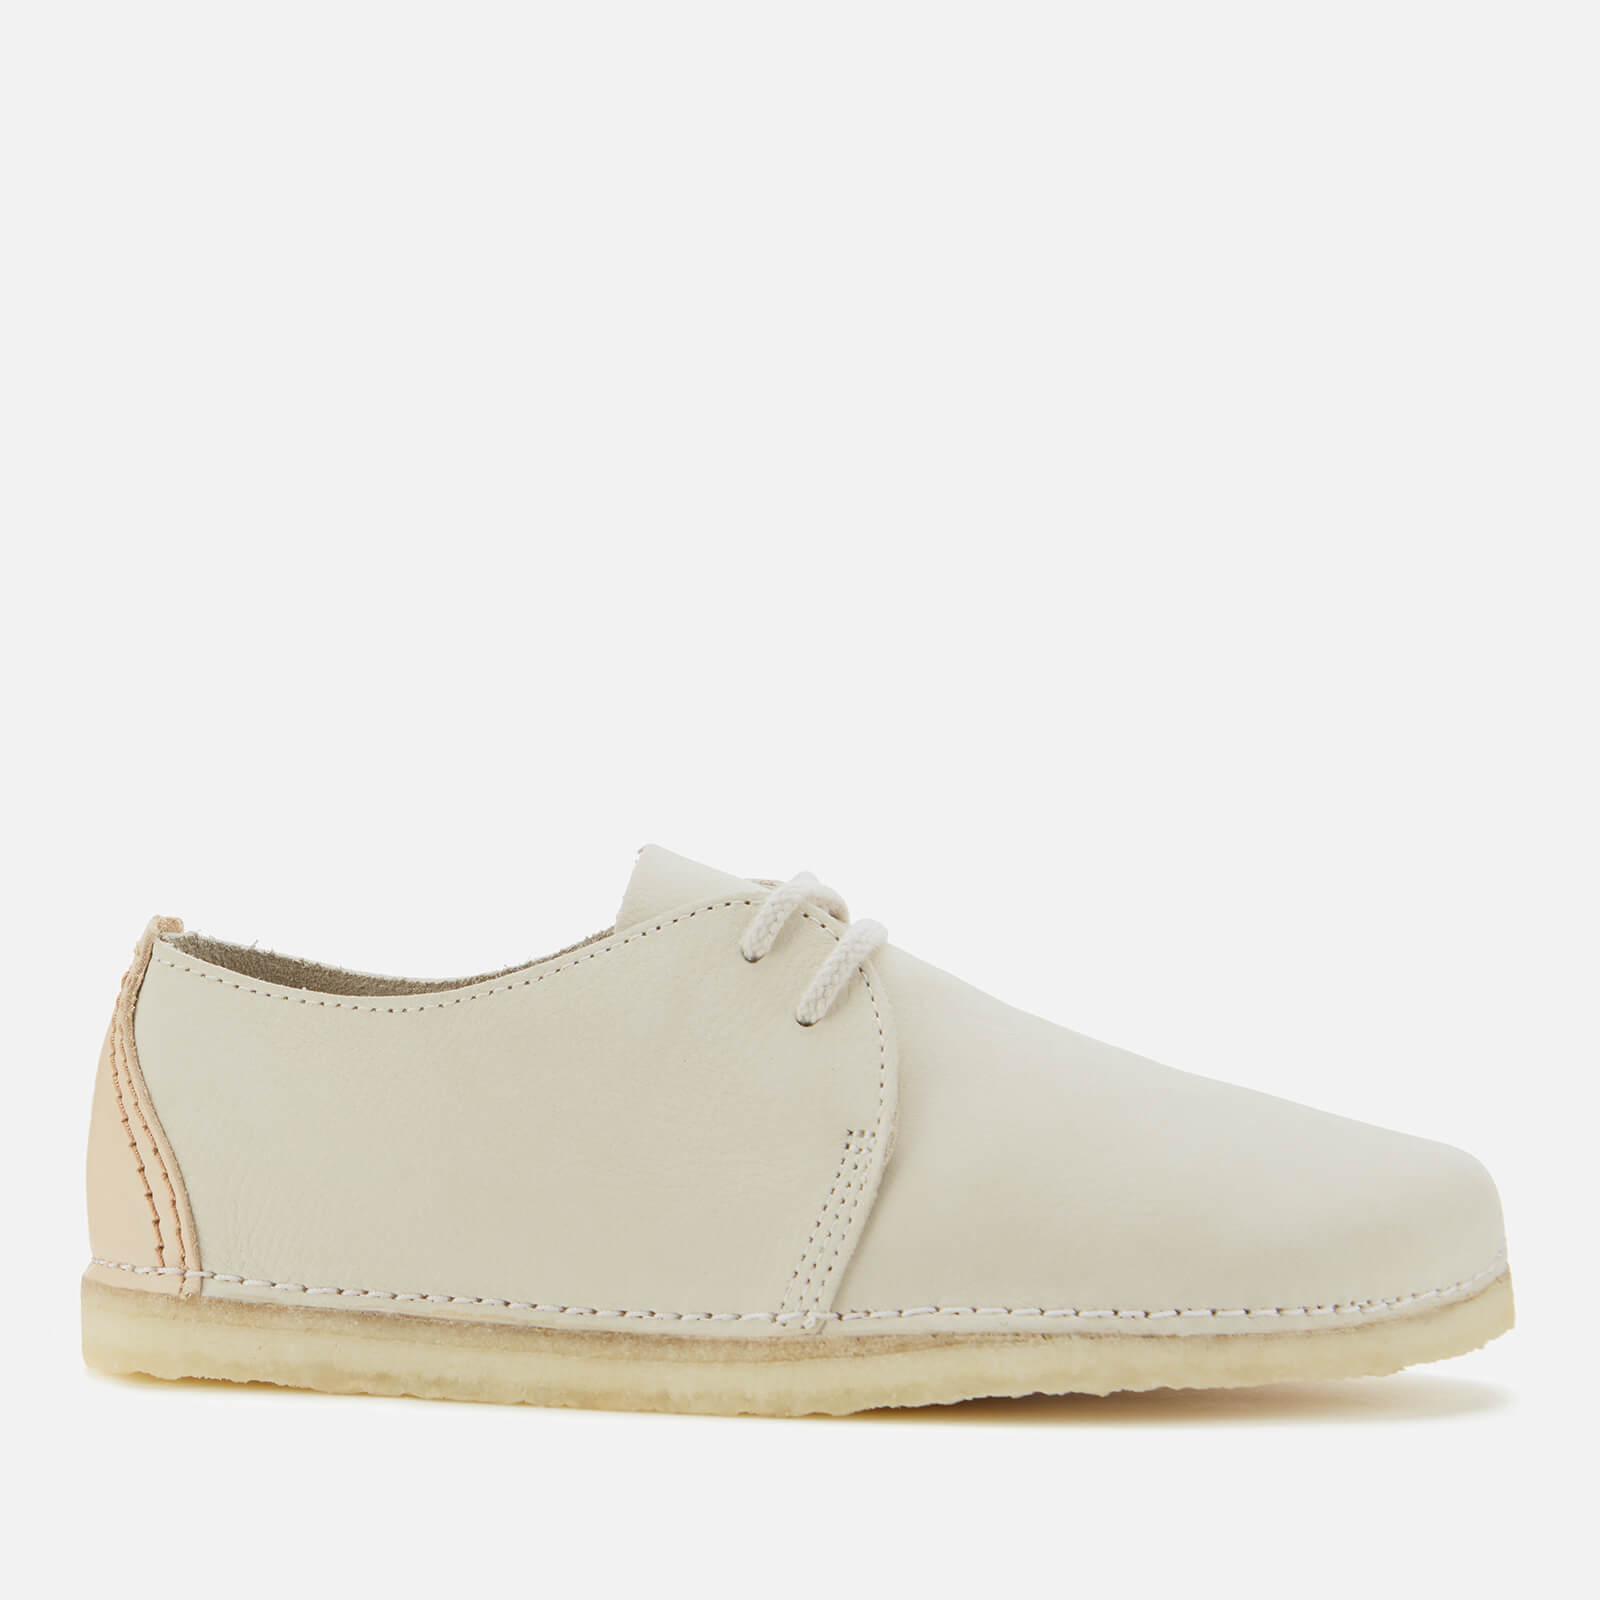 Clarks Originals Women's Ashton Nubuck Flat Shoes - Off White - UK 5